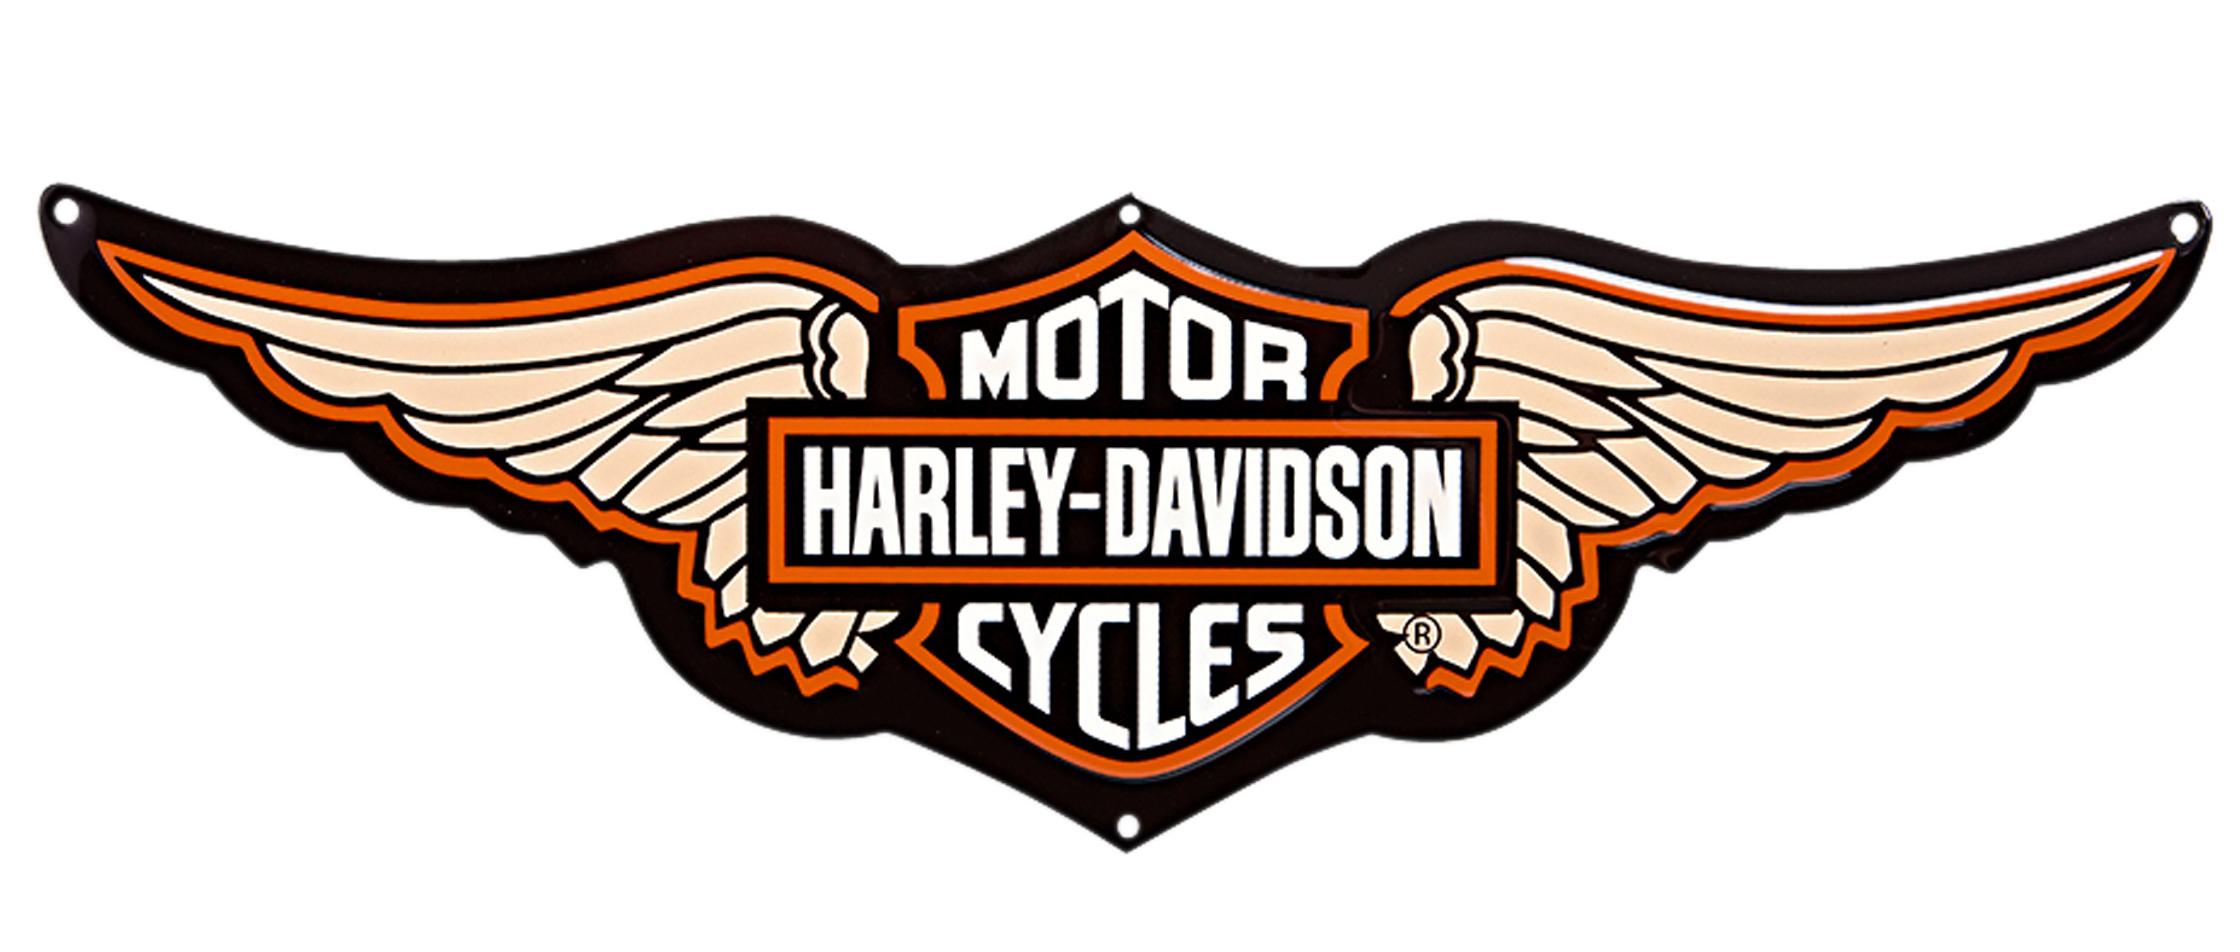 Harley Davidsons Iconic Logo Rich In Symbolism